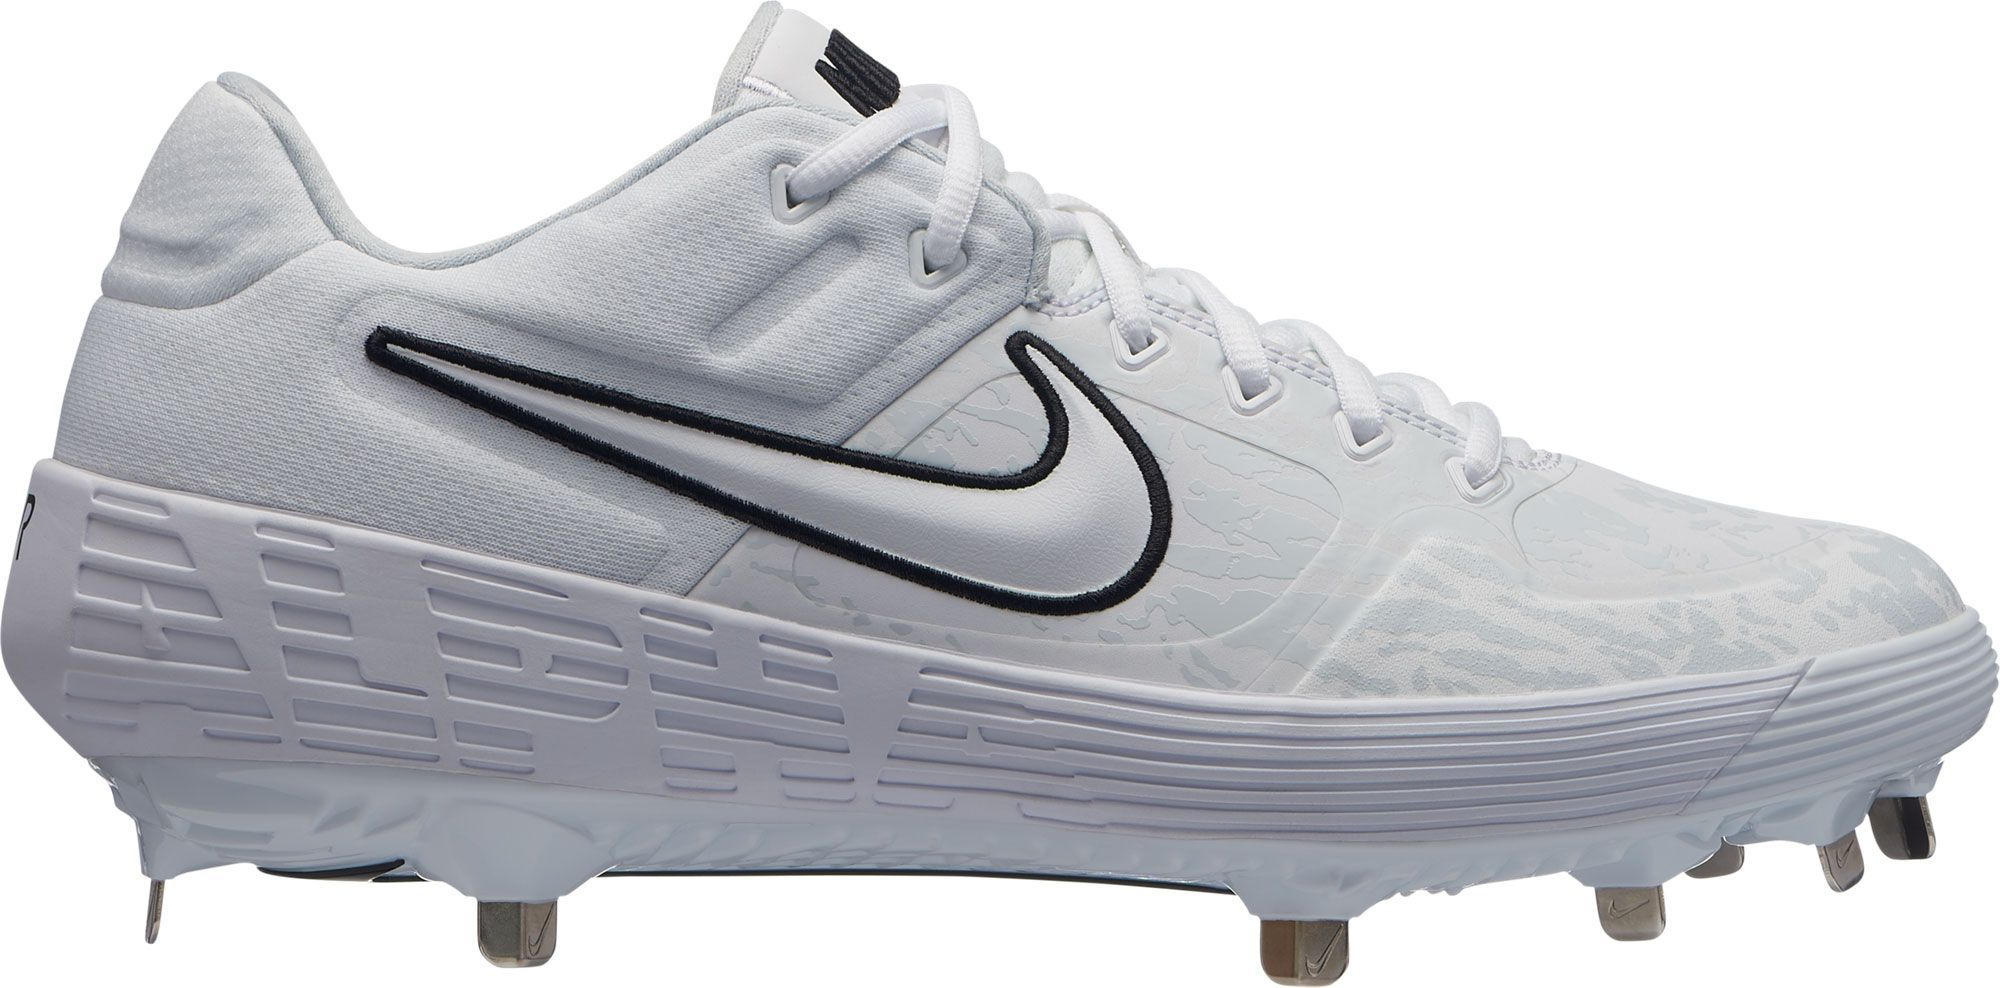 Baseball cleats, Softball cleats, Nike